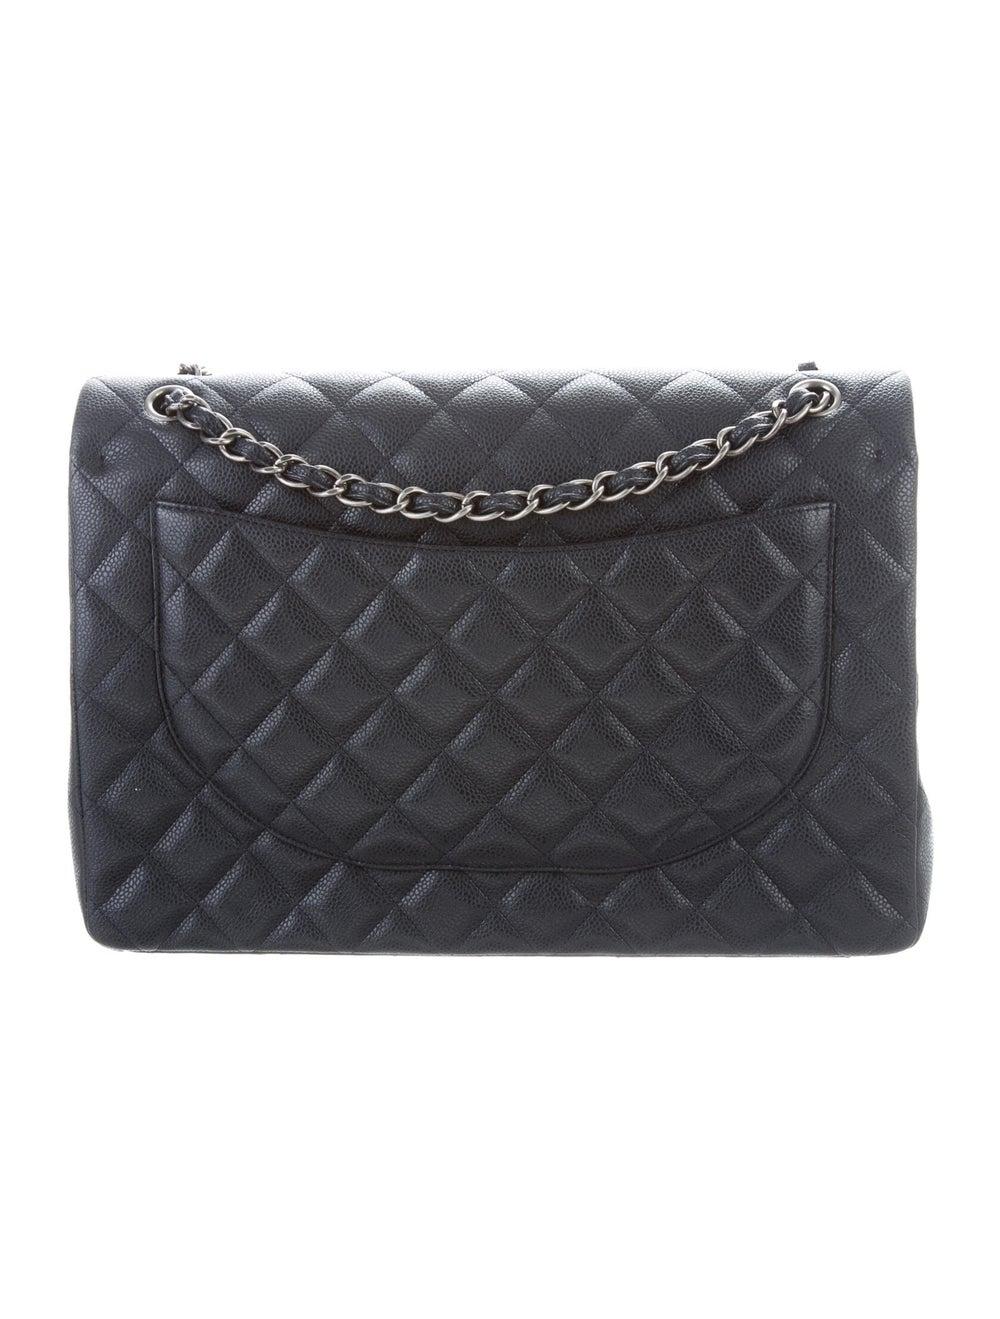 Chanel Classic Maxi Double Flap Bag Blue - image 4